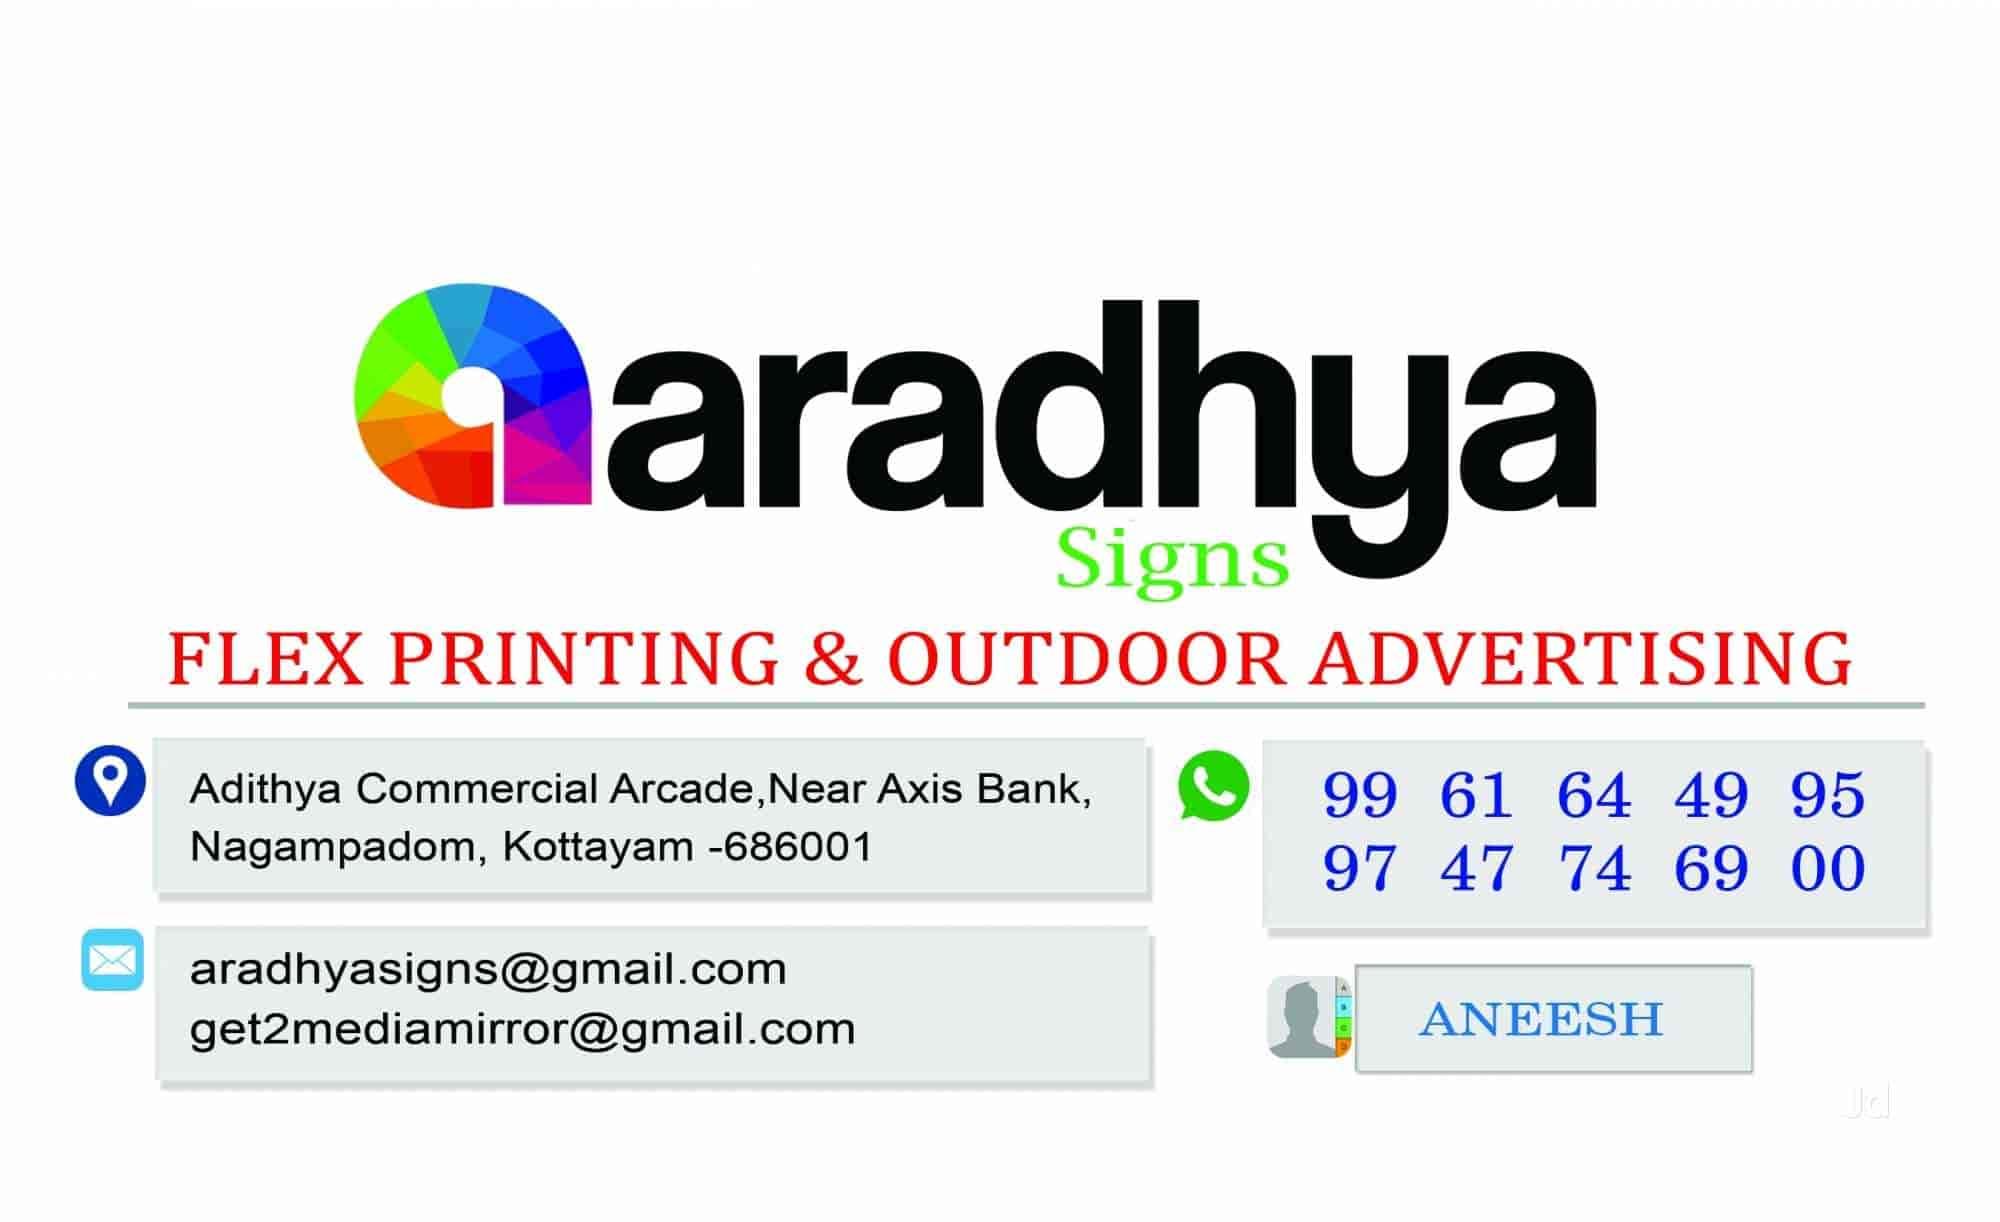 Aradhya Signs Digital Printing And Advertising, Near Axis